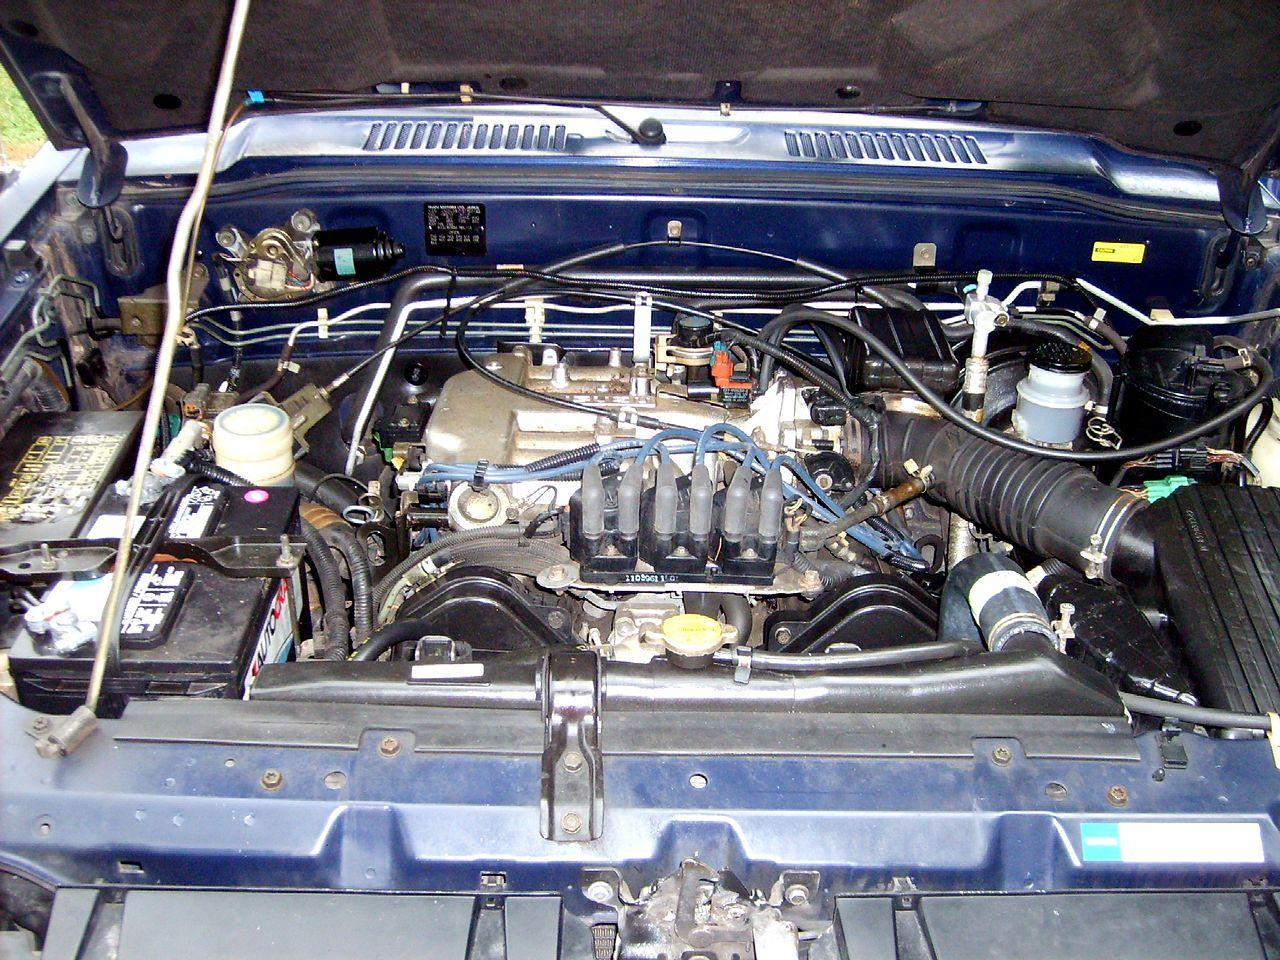 Suzuki Jimny Cc Turbo Fuel Consumption